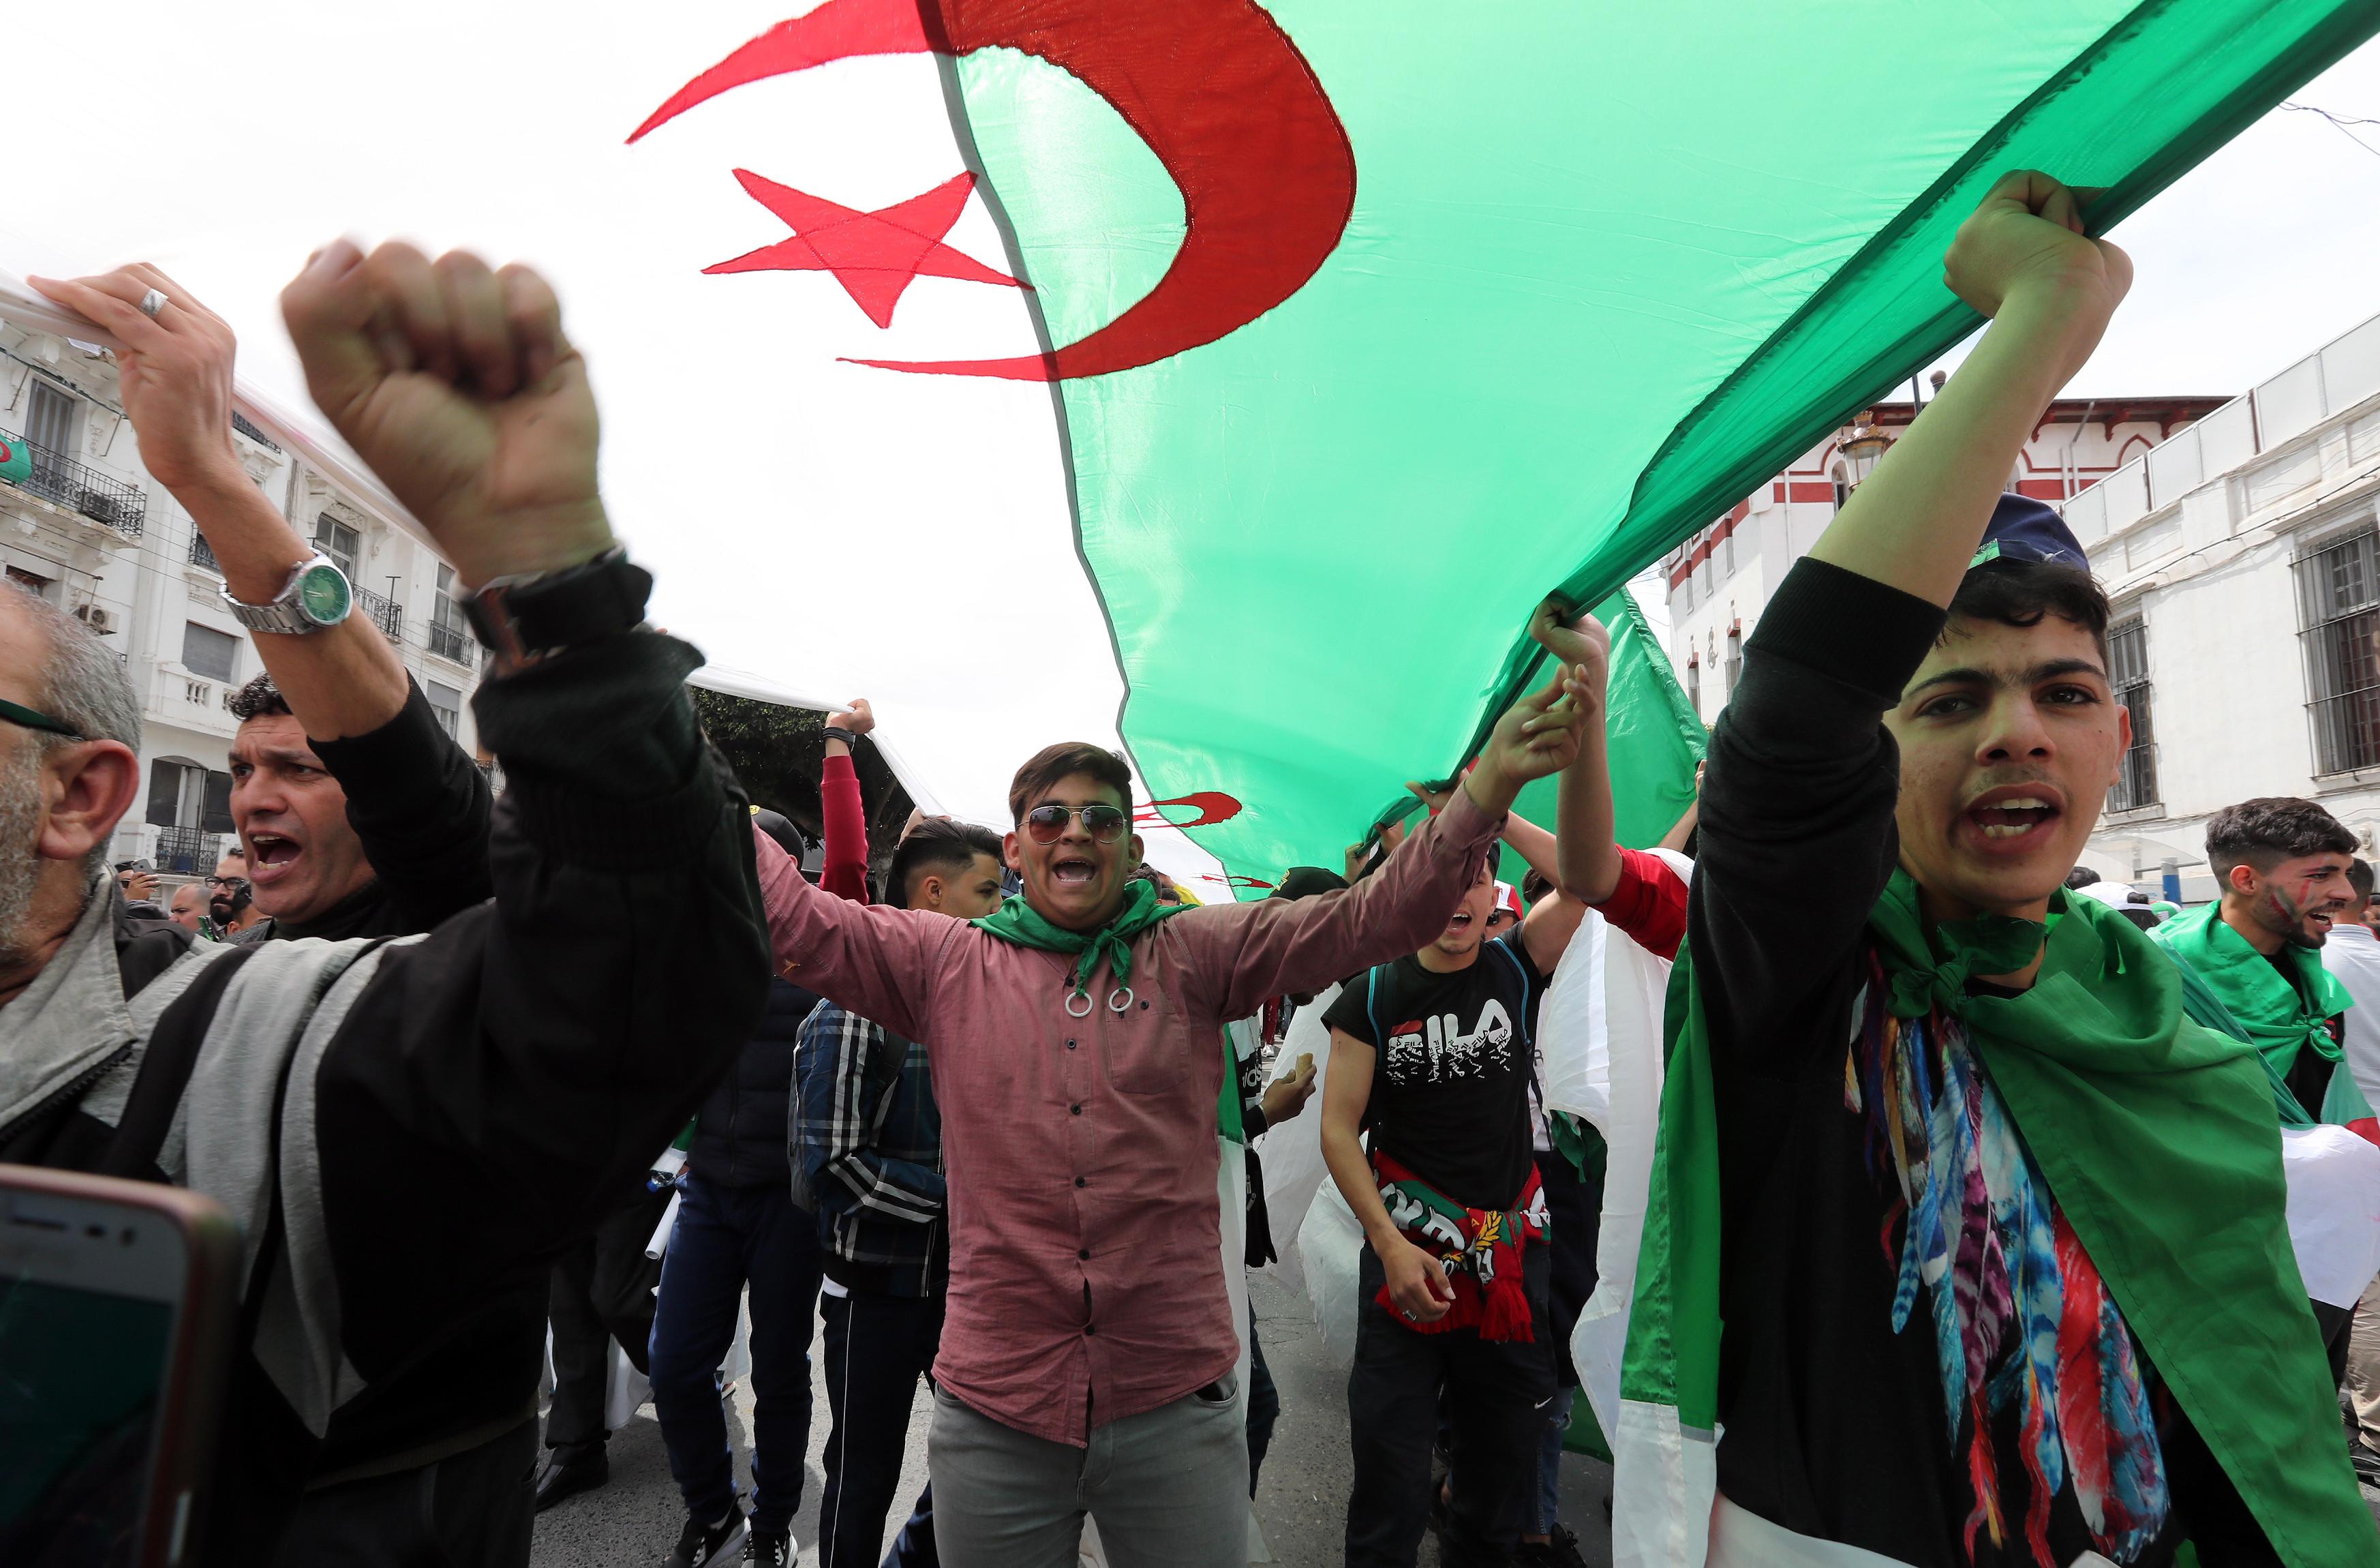 Ministro argelino impedido de sair do aeroporto por manifestantes